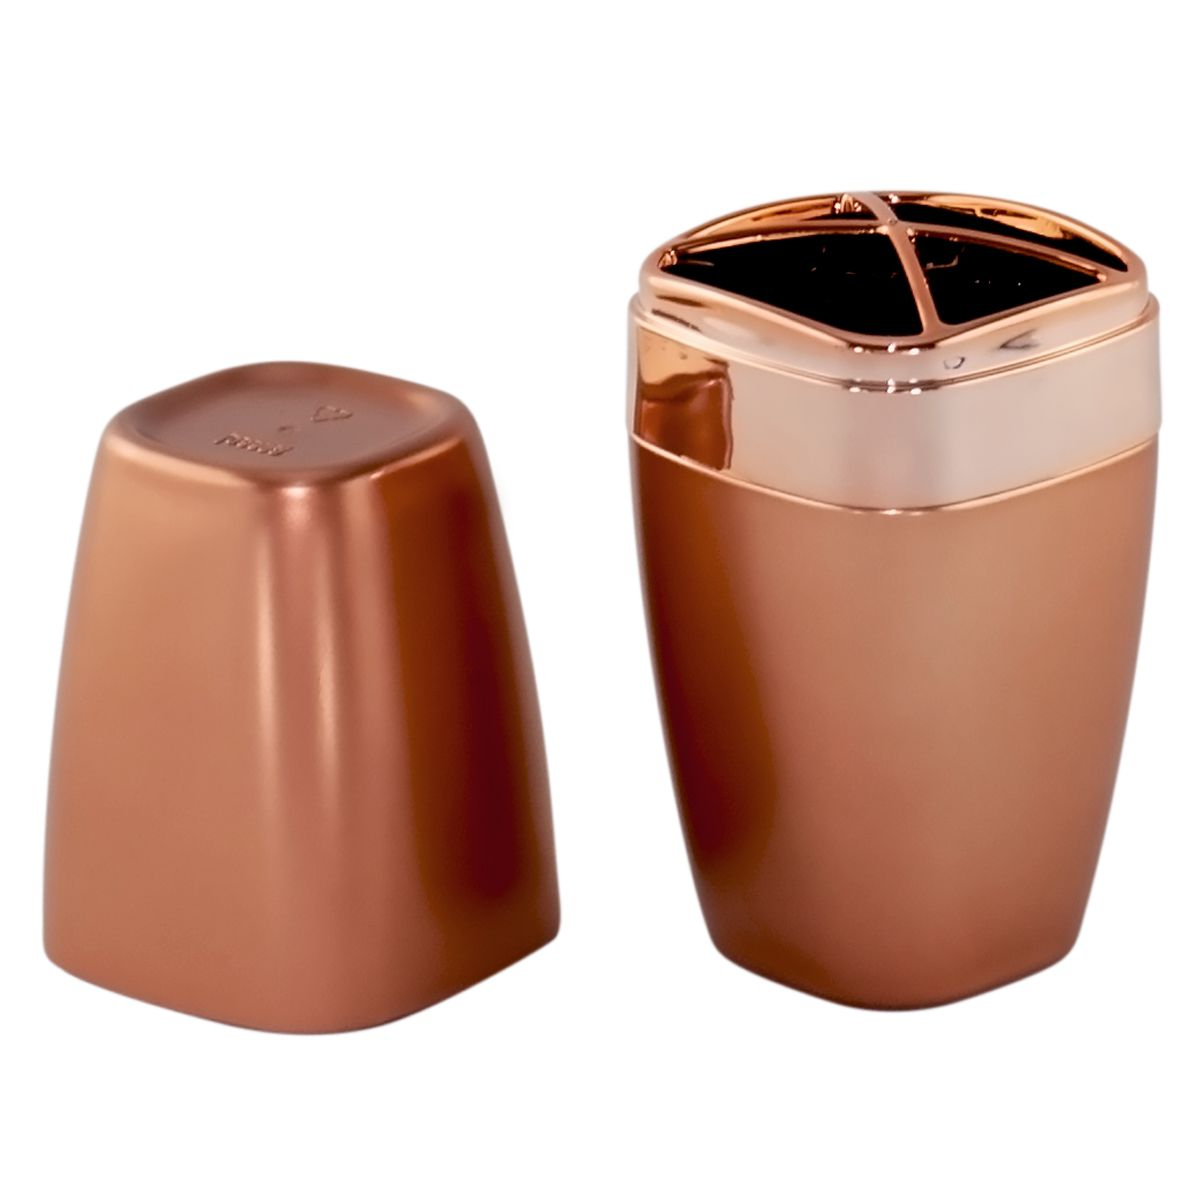 Porta Escova Creme Dental Cobre Rosé Gold Fosco